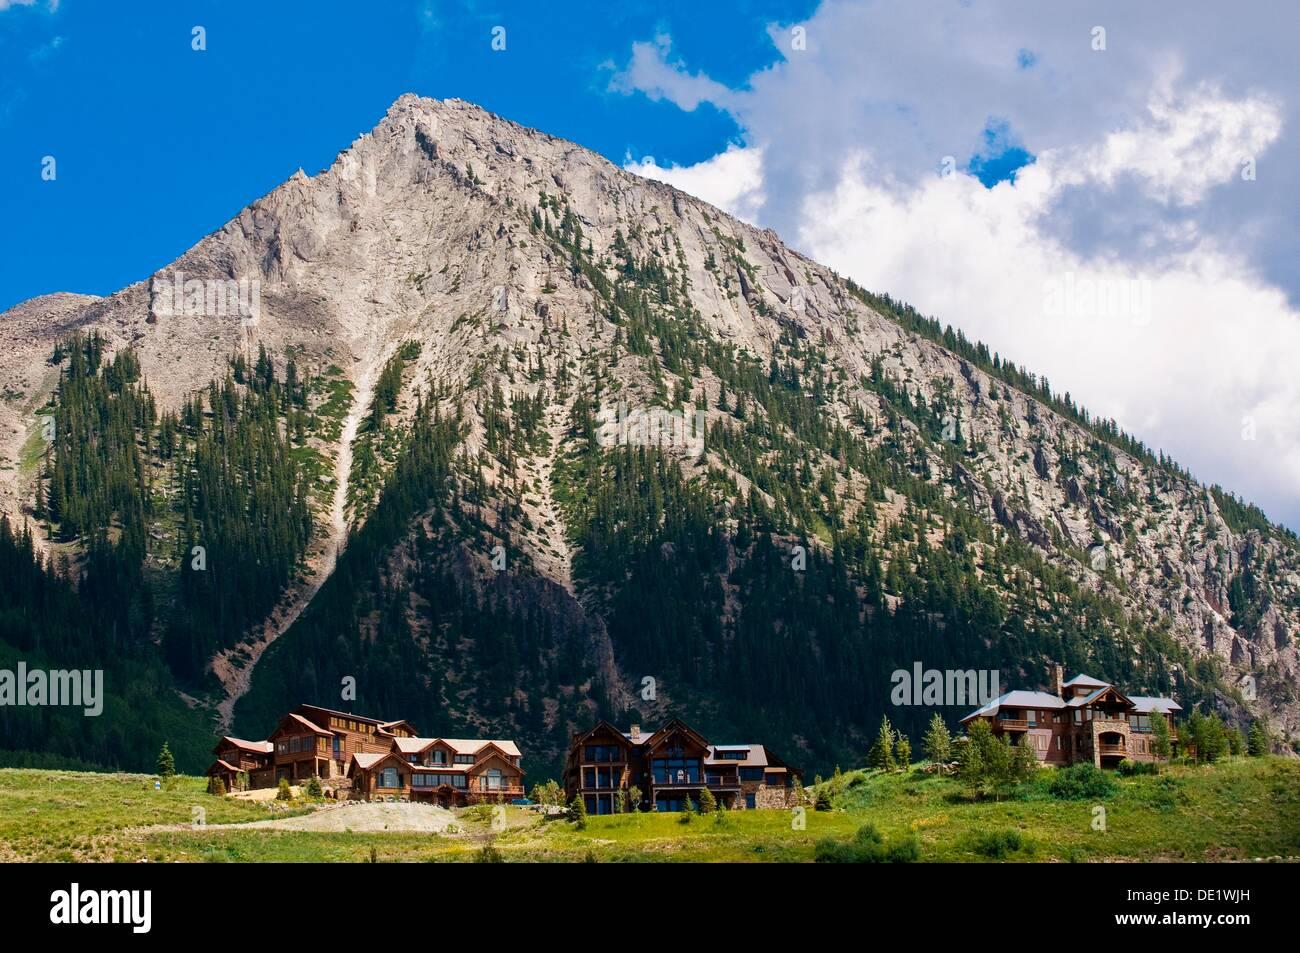 Mt  Crested Butte ski resort, near Crested Butte, Colorado USA - Stock Image